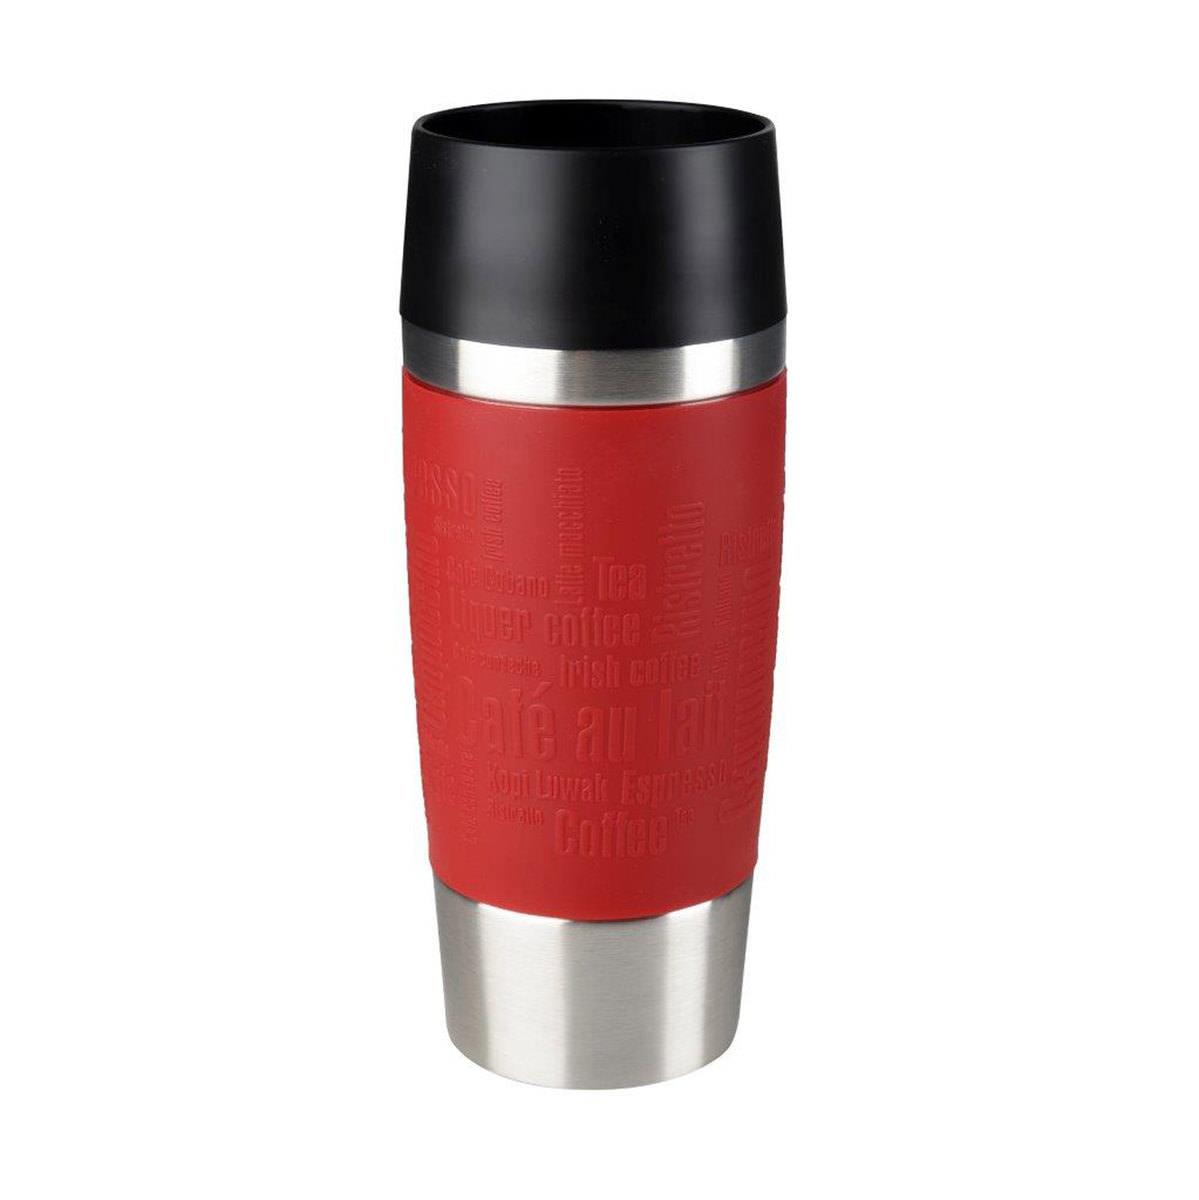 emsa thermobecher travel mug in rot 0 36 liter jetzt im kodi onlineshop kaufen alles f r den. Black Bedroom Furniture Sets. Home Design Ideas